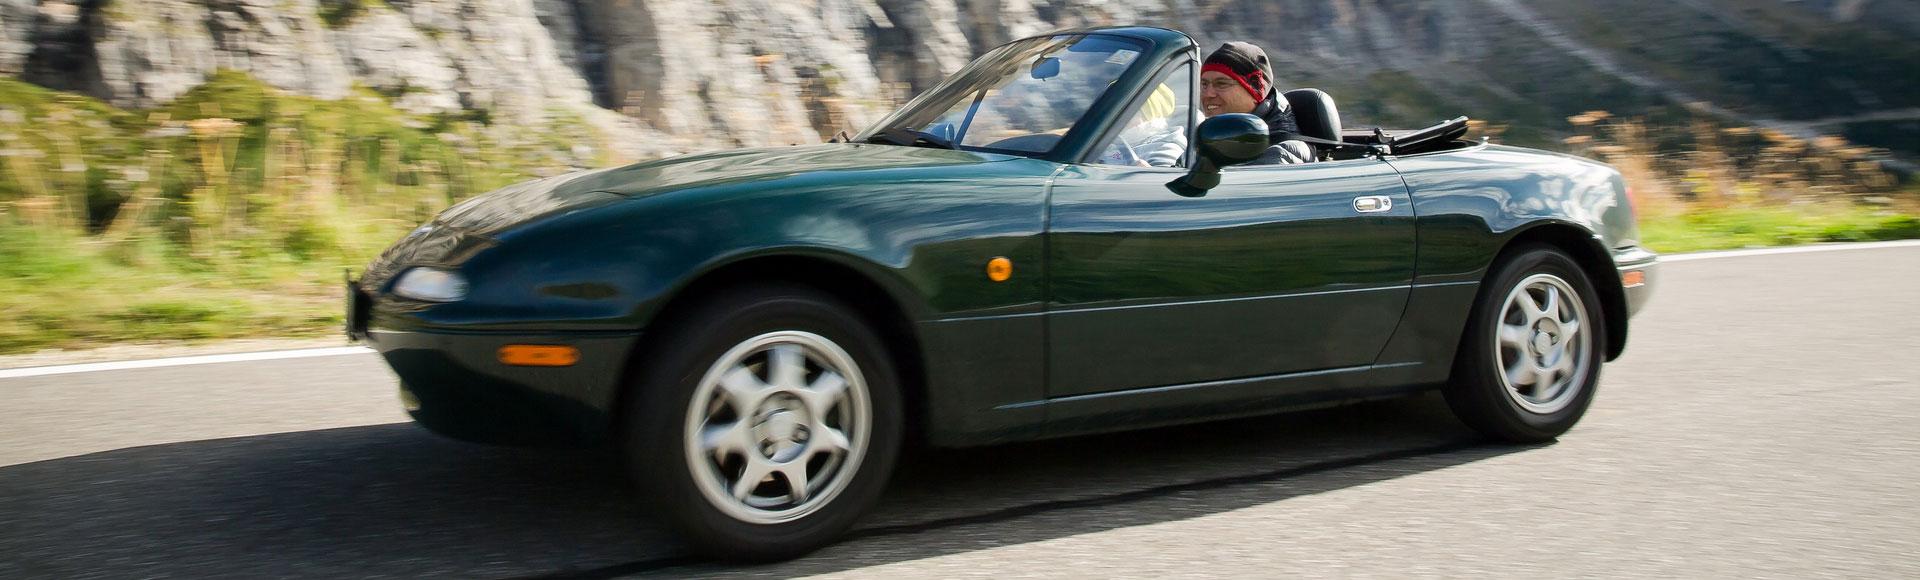 Mazda MX5 1995 0163 Sommer